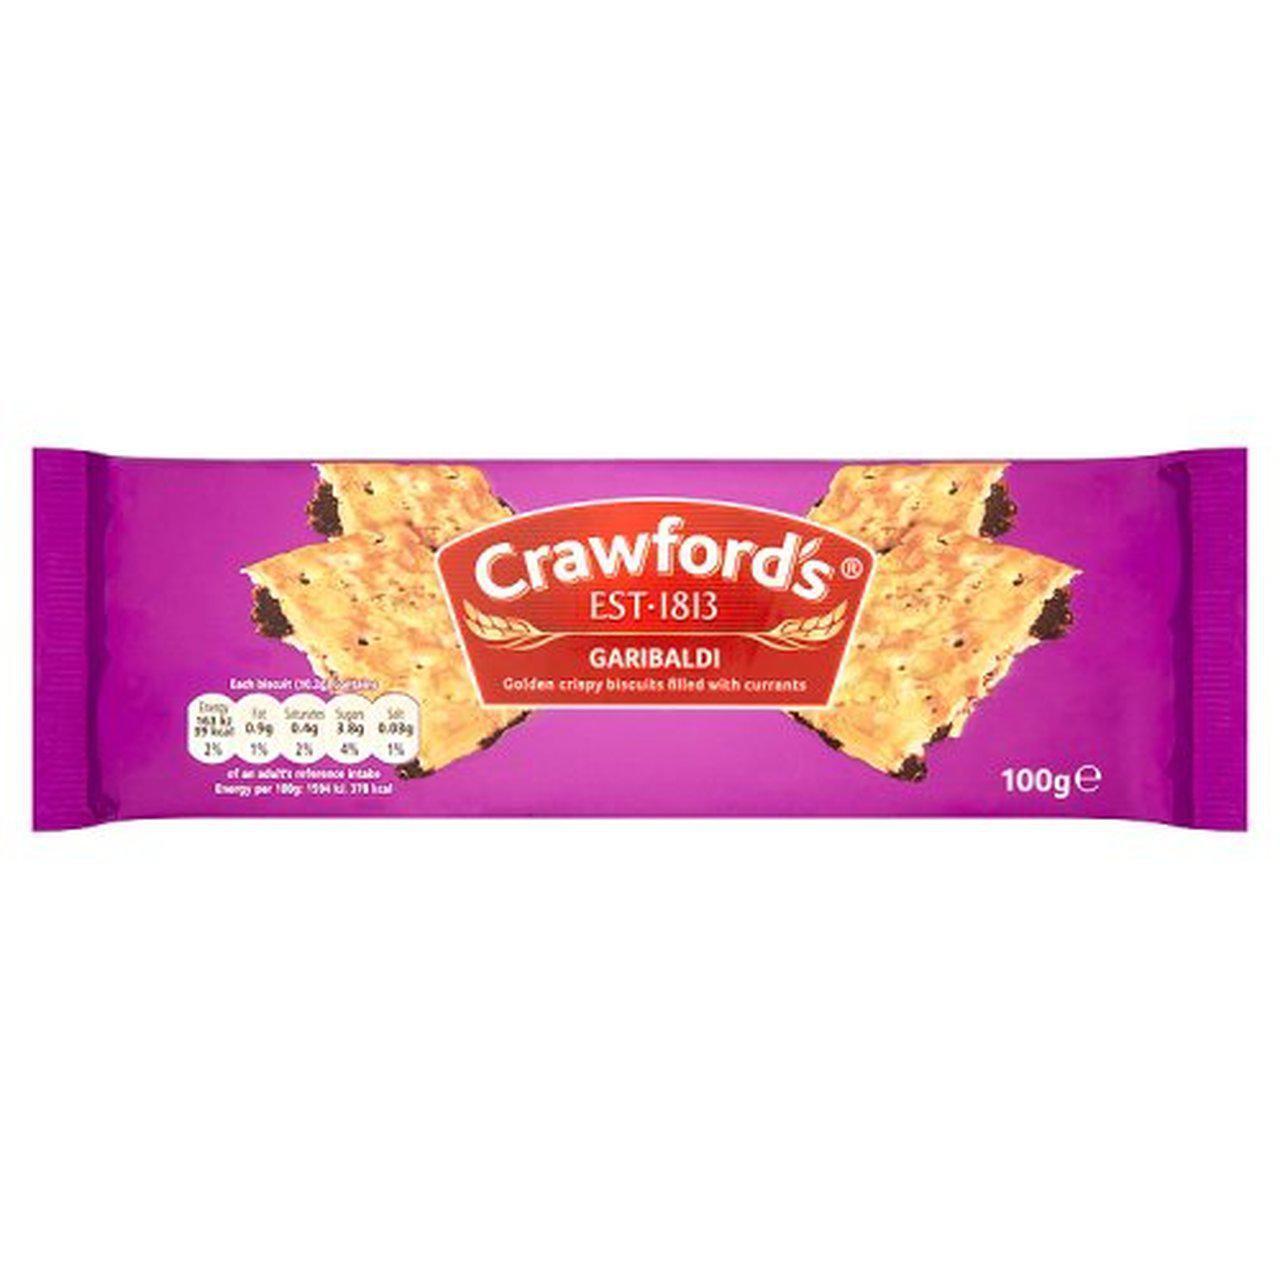 Crawford's Garibaldi, 100g